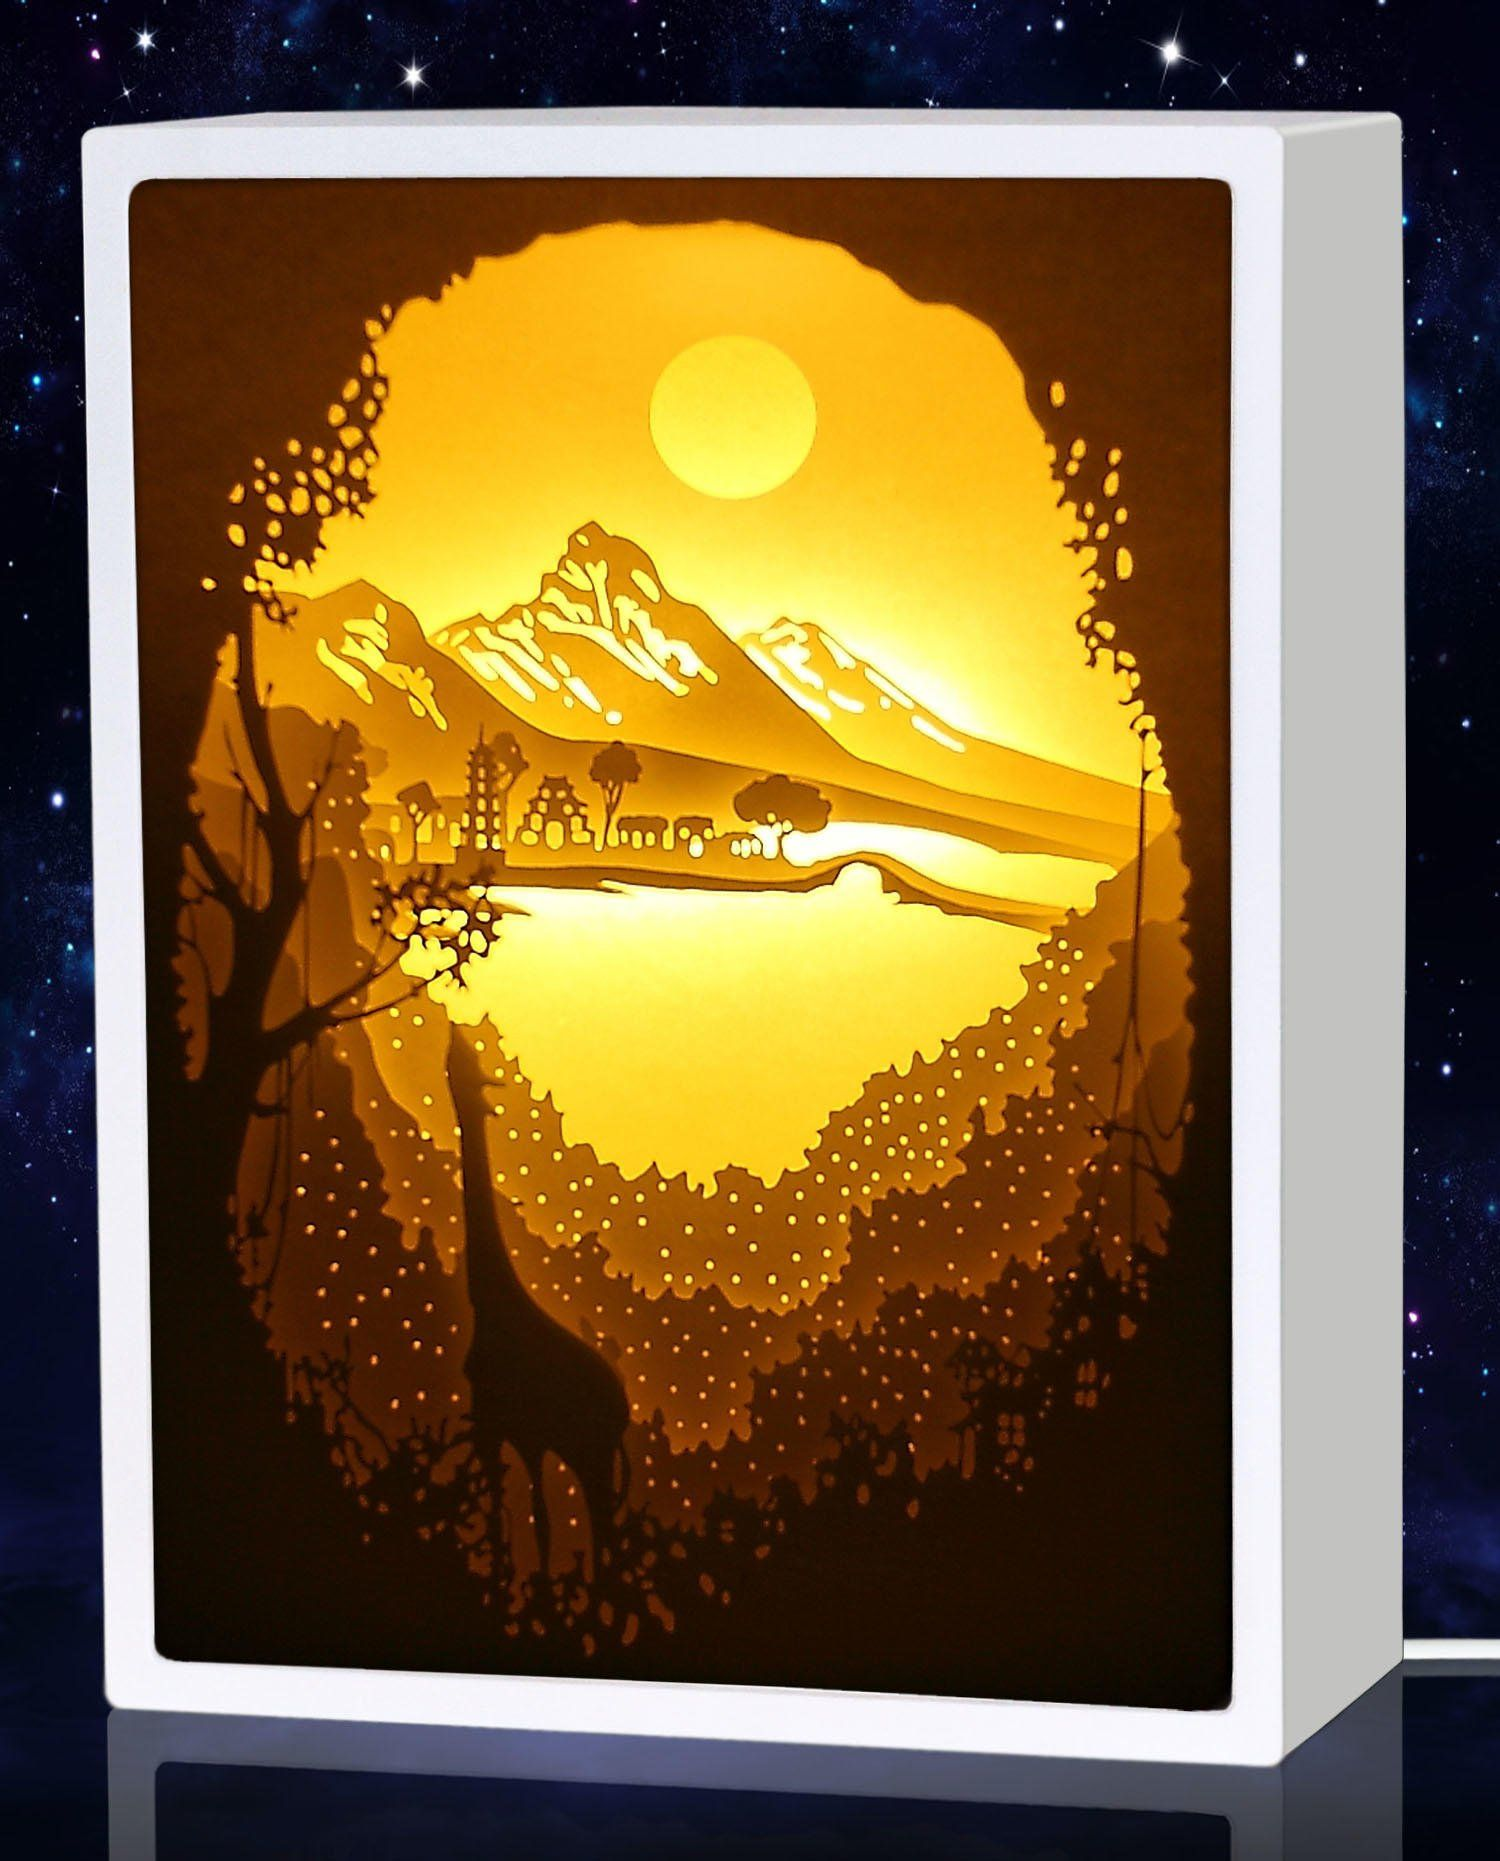 decorsmart papercut light boxes giraffe and shangri la night